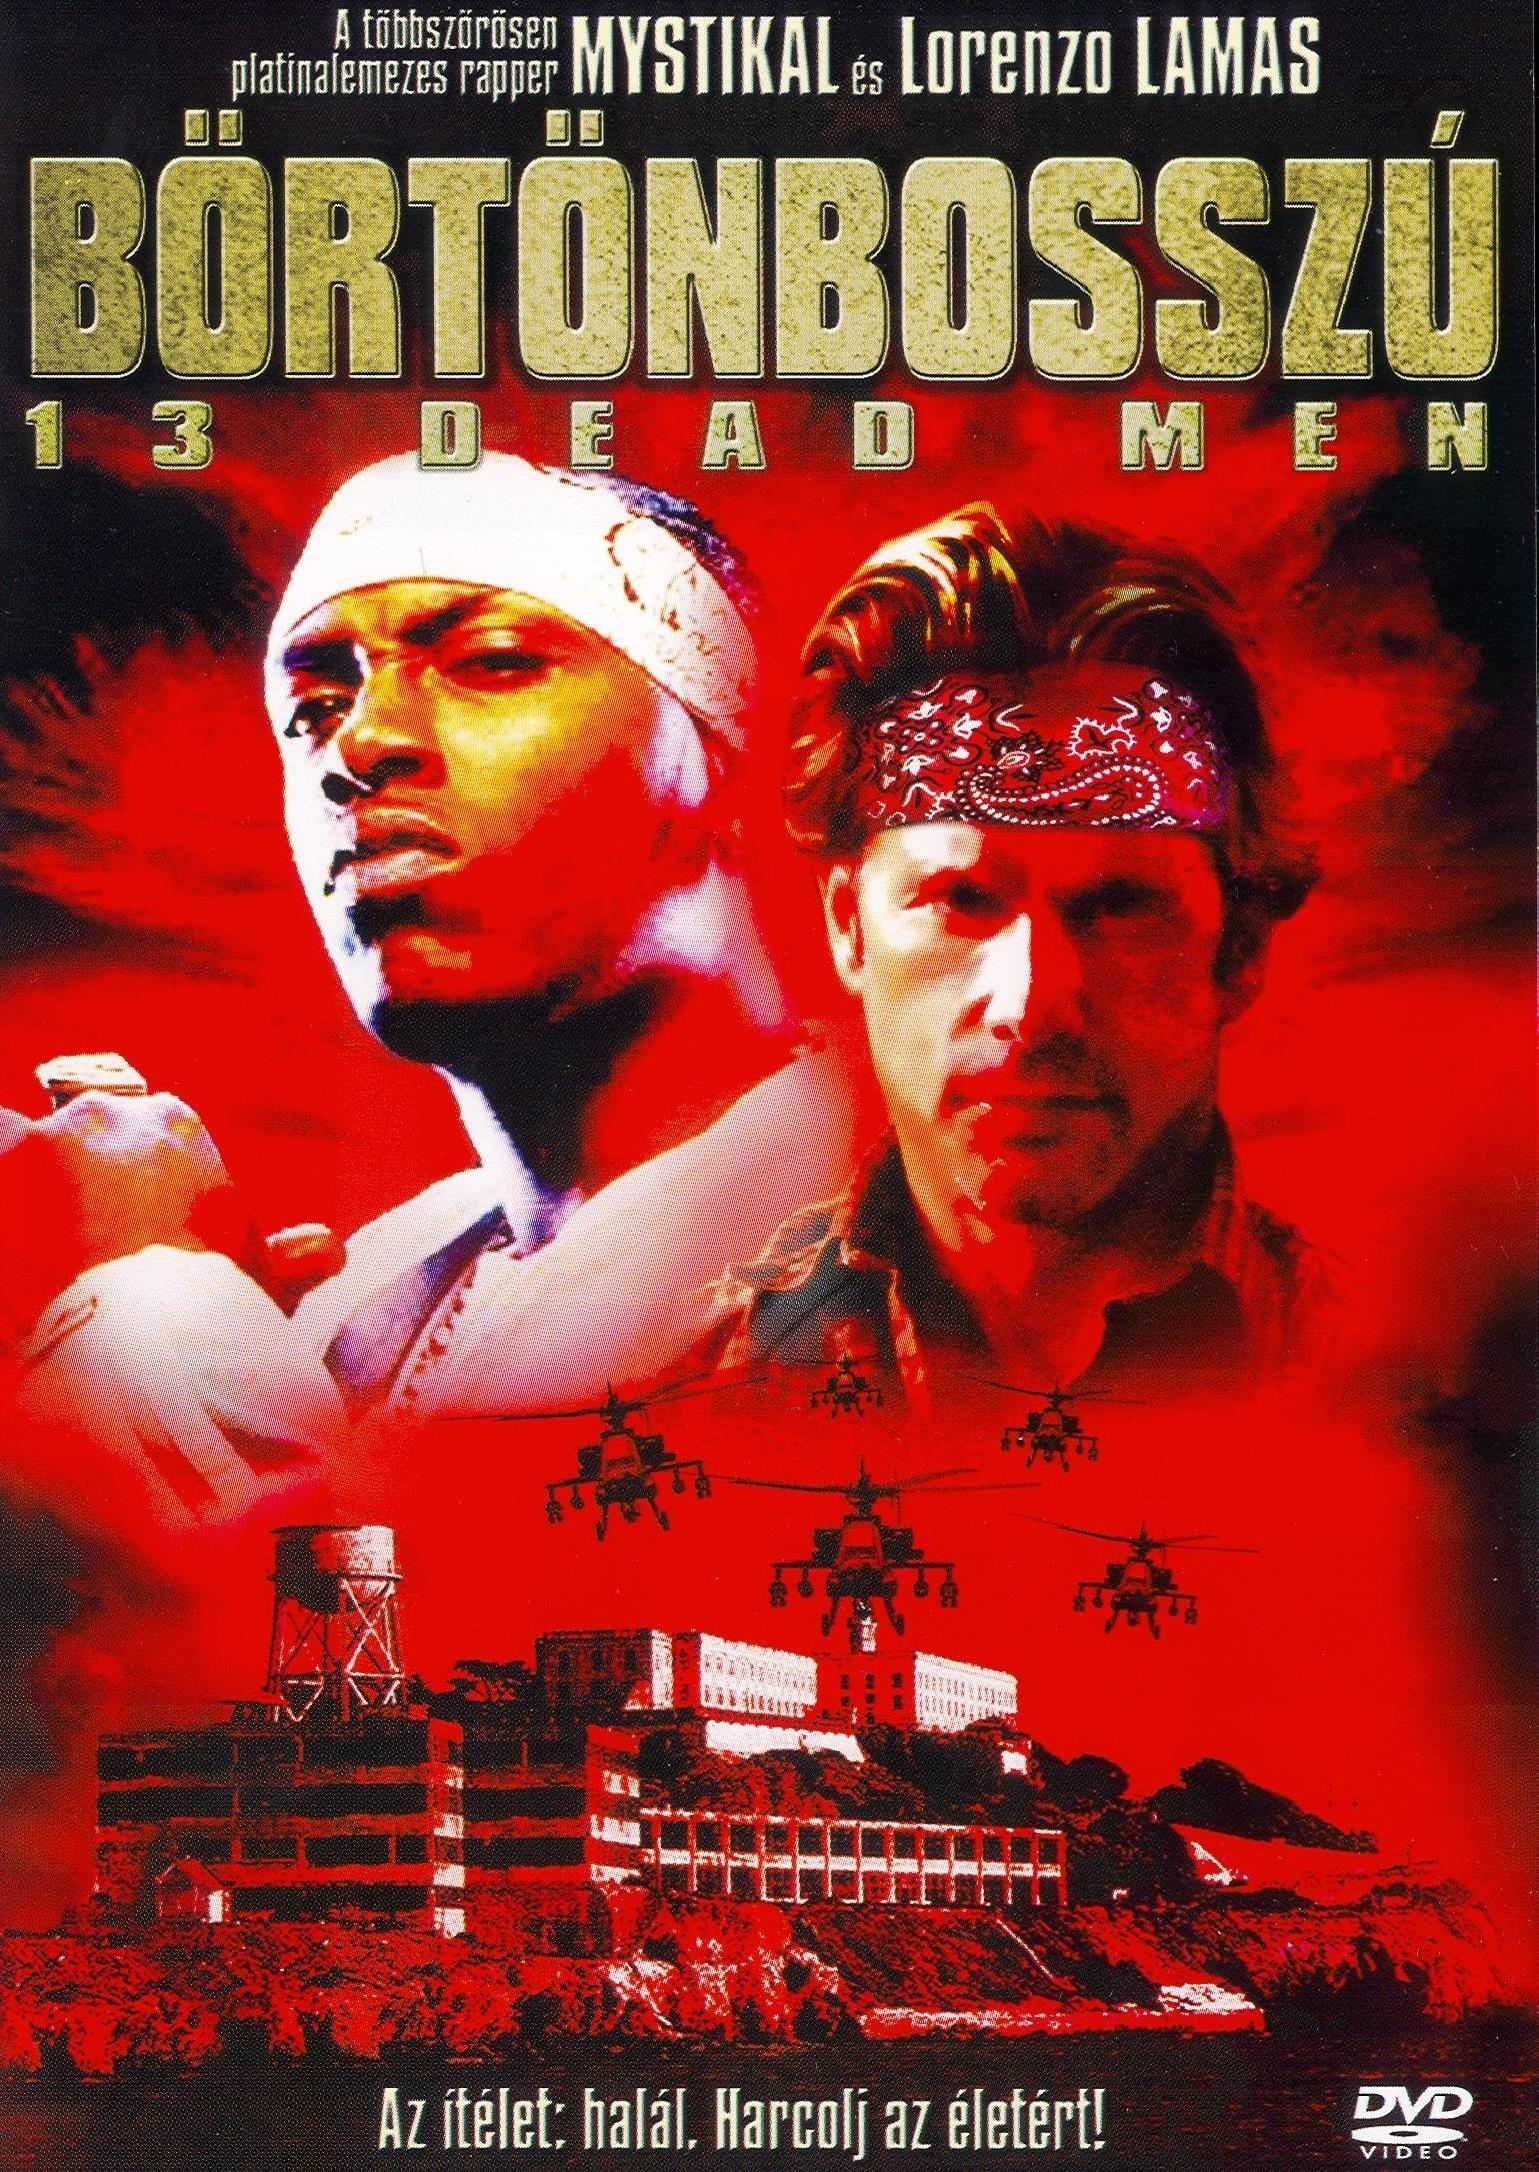 13 Dead Men (2003)